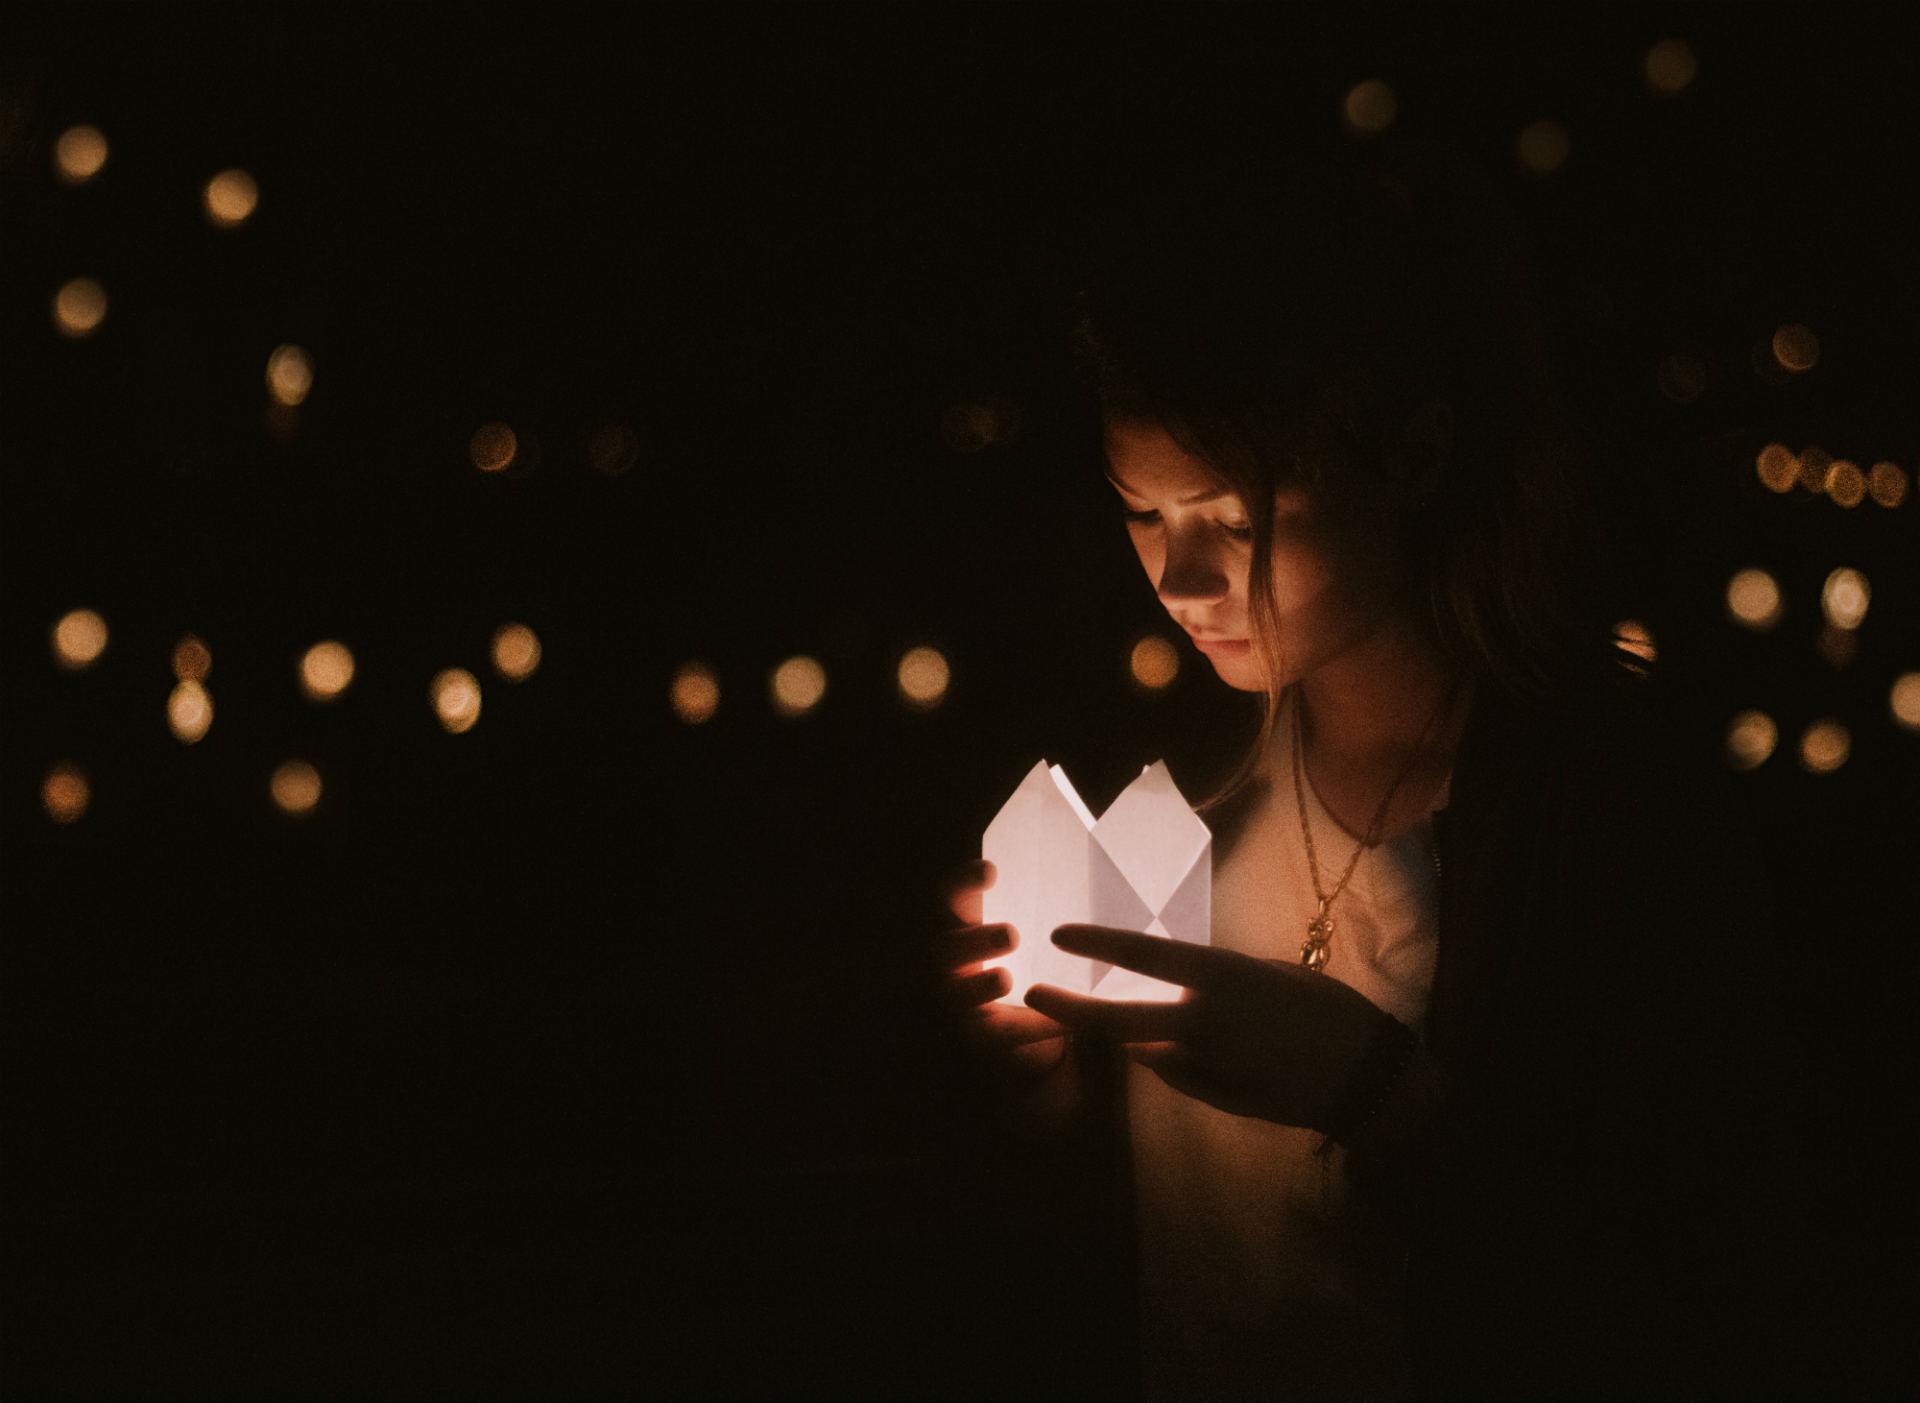 light-mona-diaz-therapies